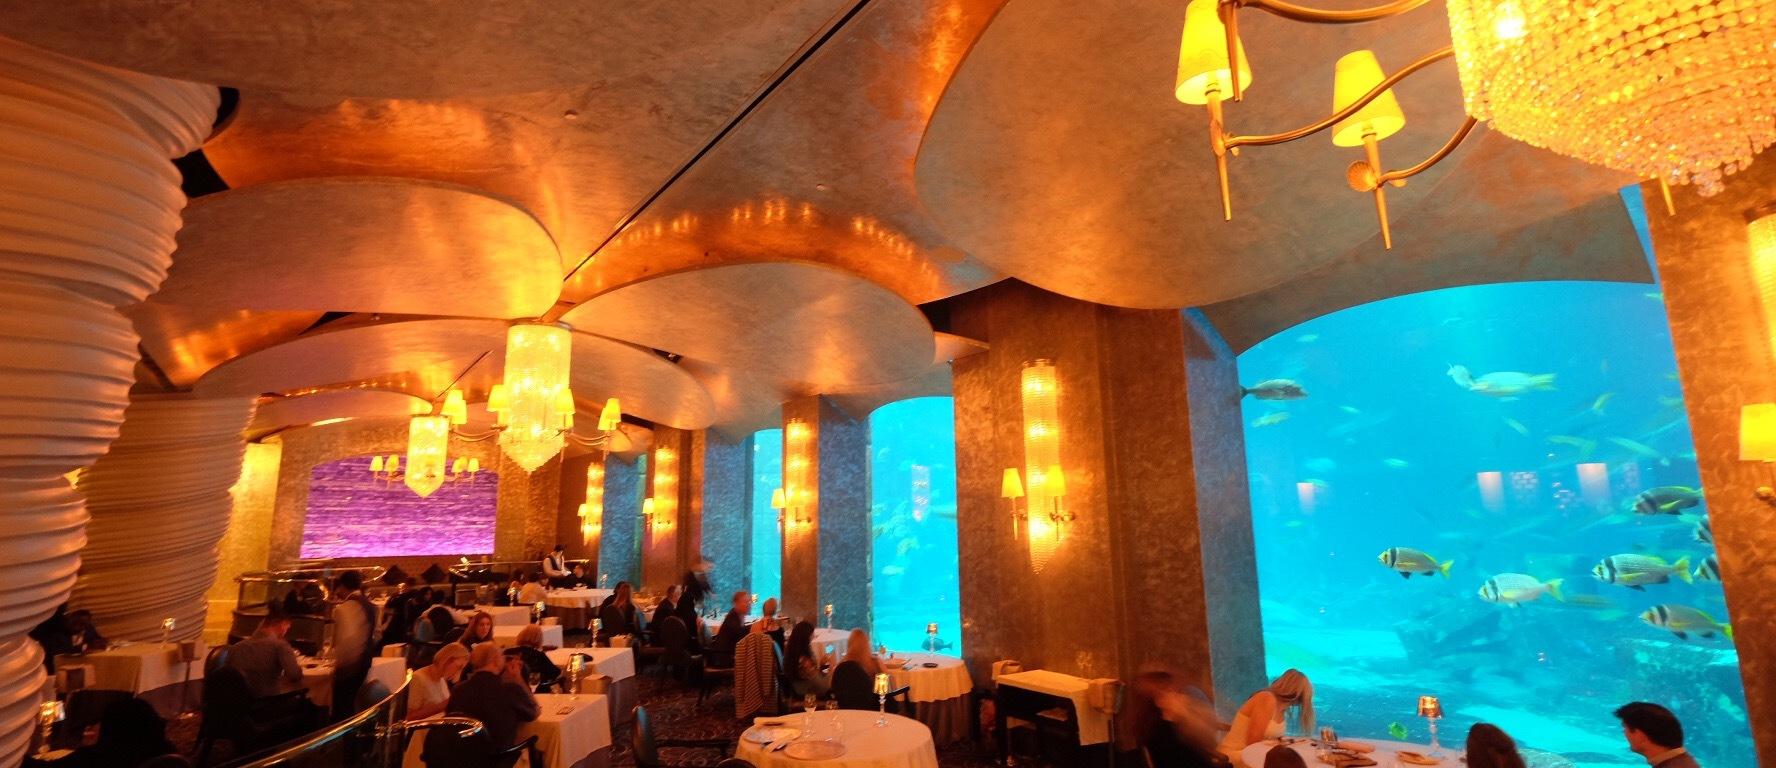 Ossiano Restaurant Sensasi Makan Malam Di Dubai Seharga Rp 4 Juta Meja Amber